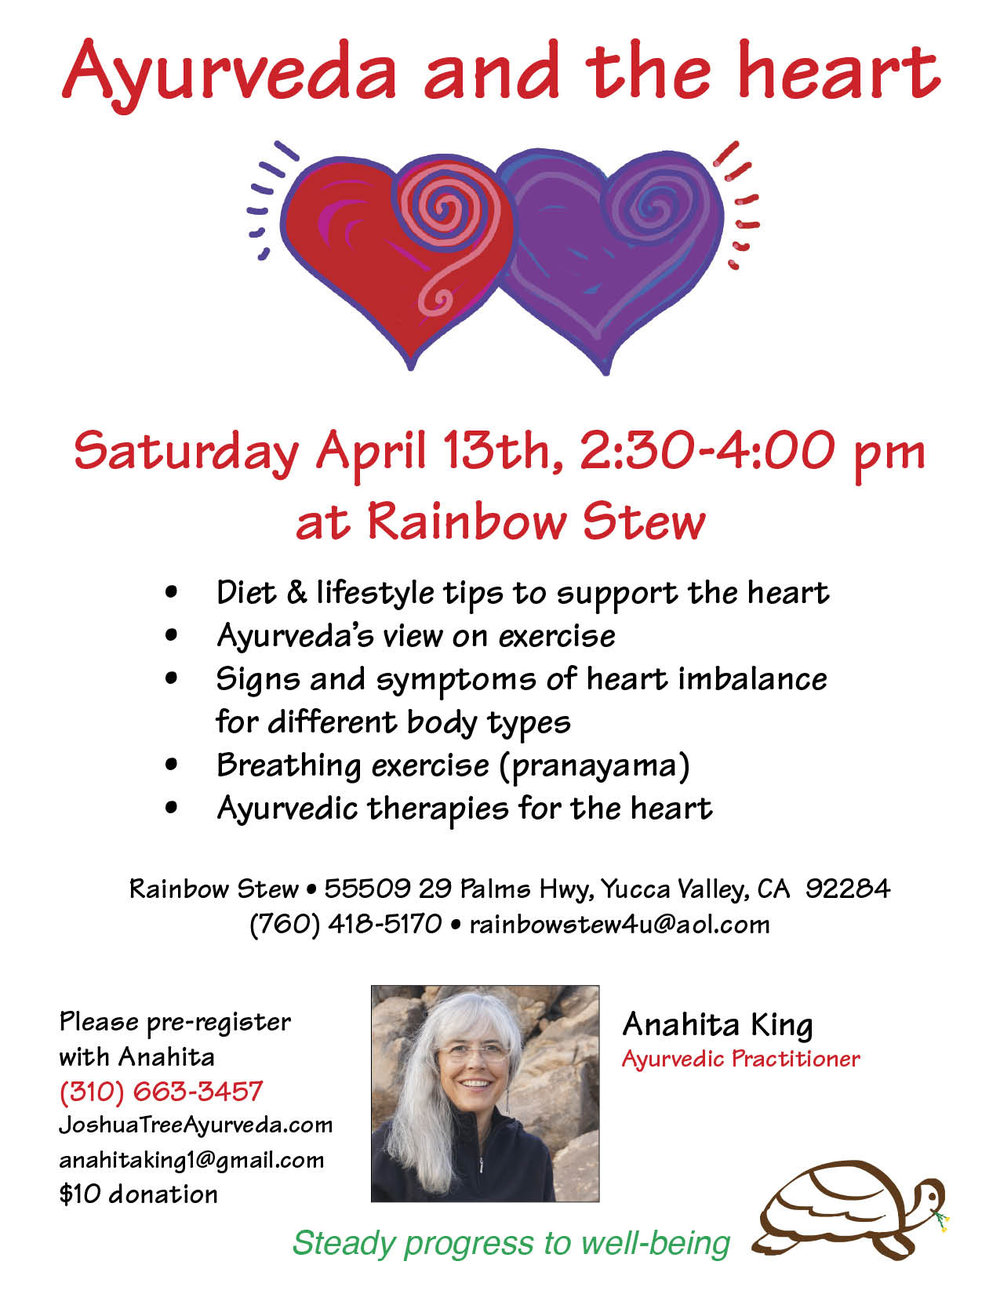 Heart presentation at Rainbow Stew, Yucca Valley